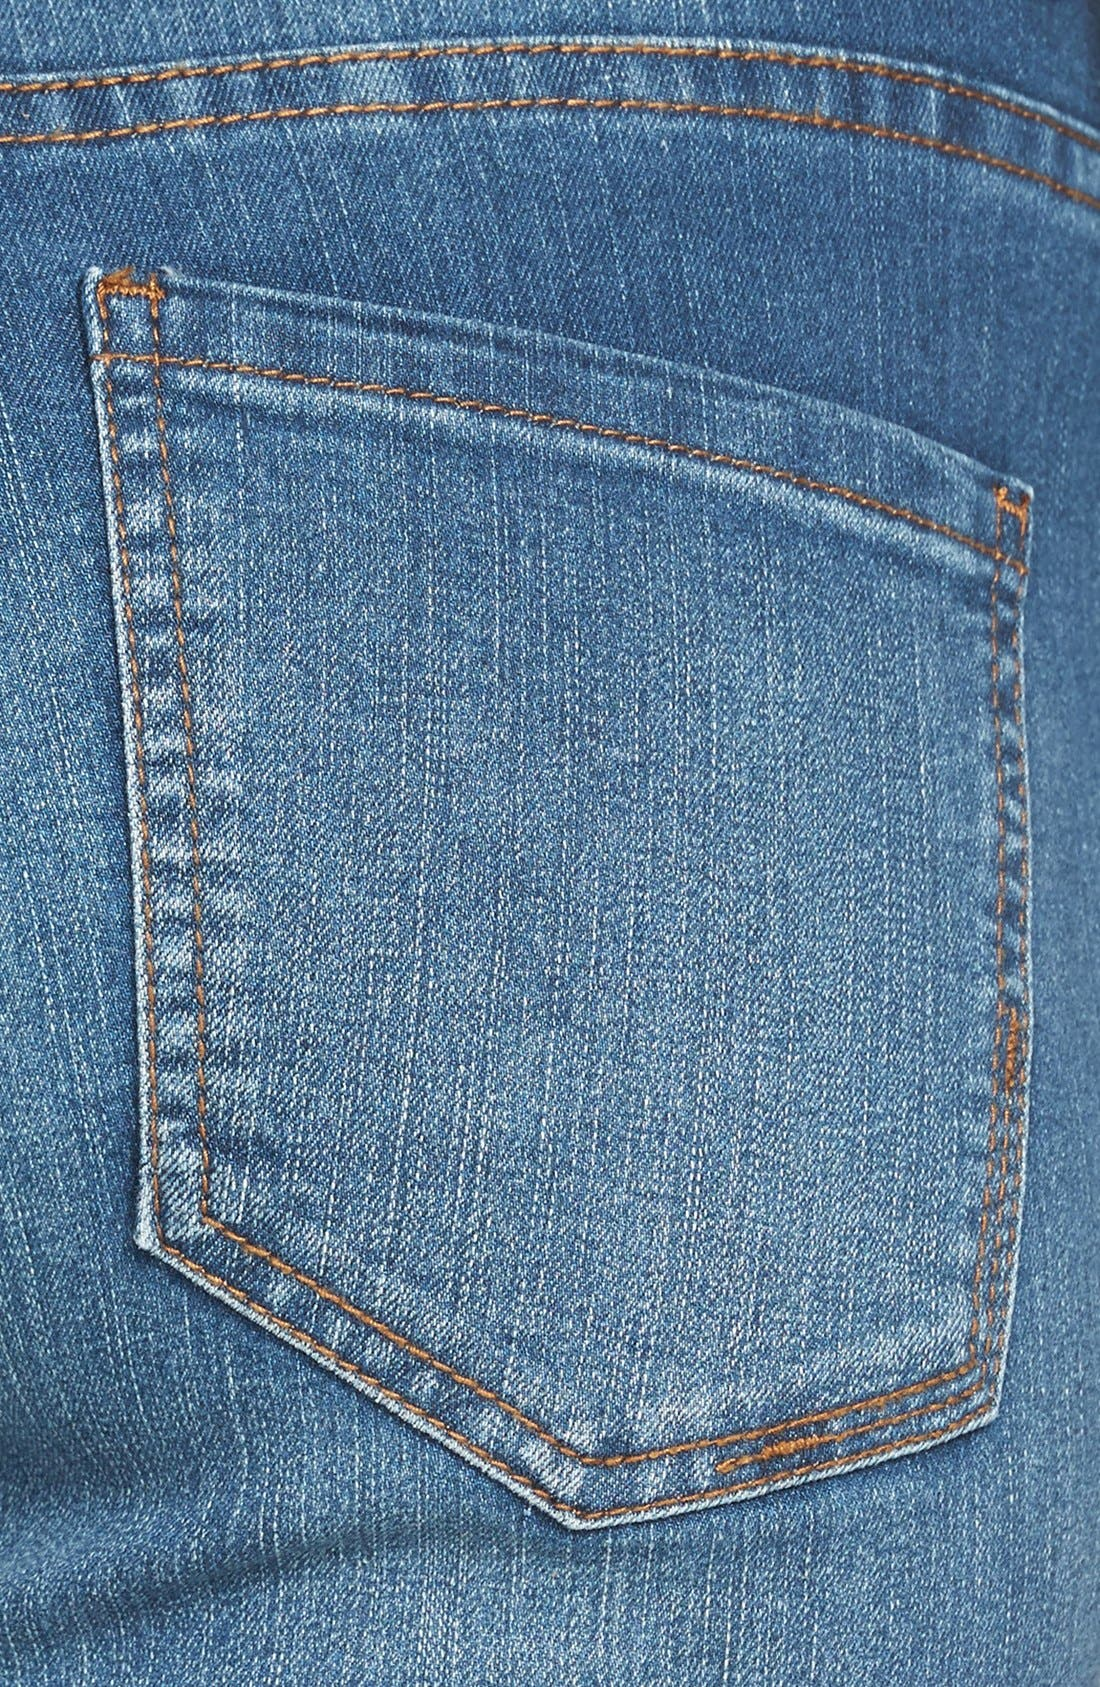 Alternate Image 3  - Liverpool Jeans Company 'Michelle' Cuffed Stretch Capri Jeans